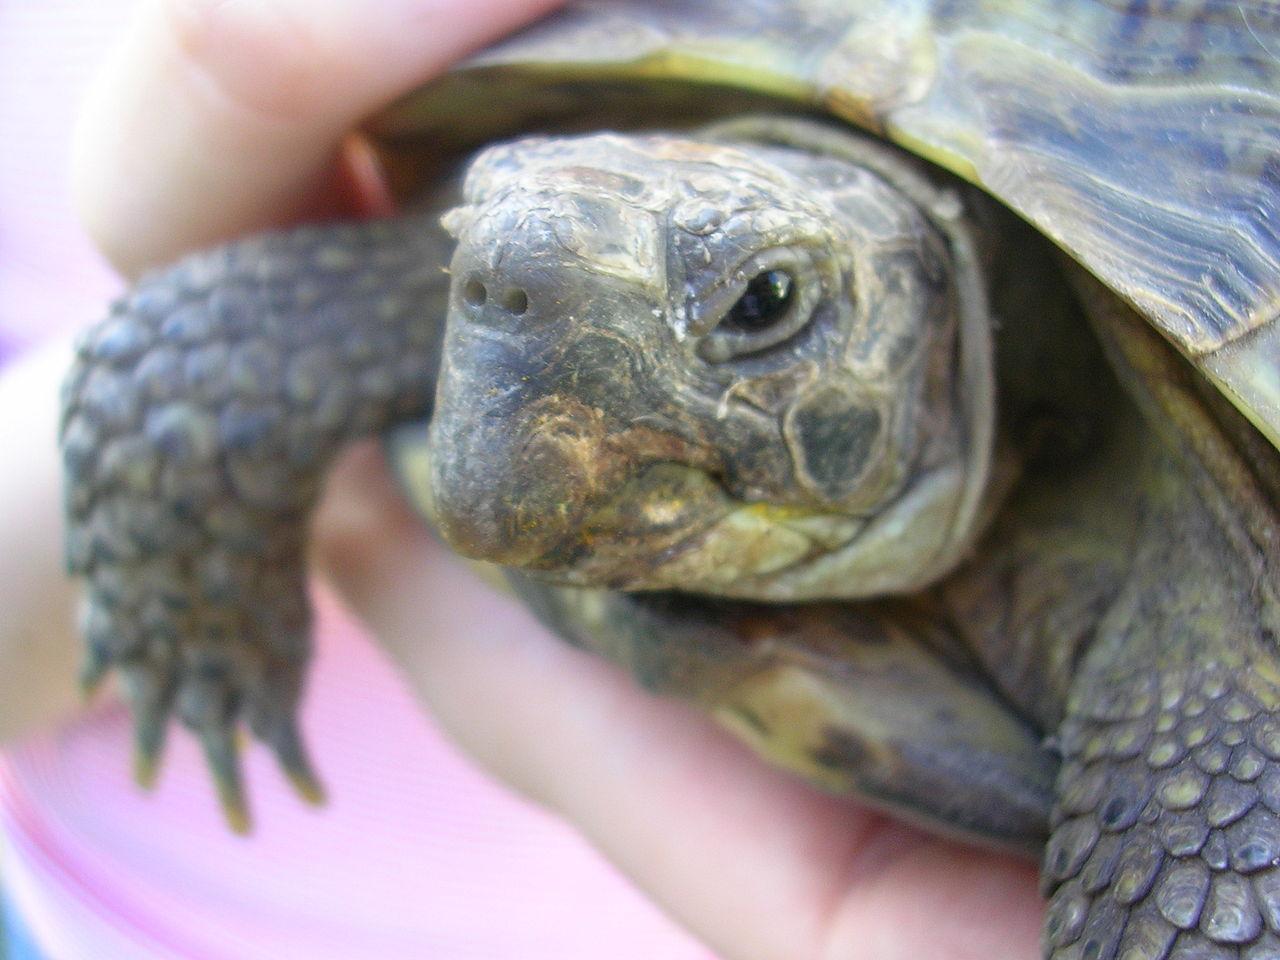 Adorables Tortugas Terrestres (Tortugas Rusas)